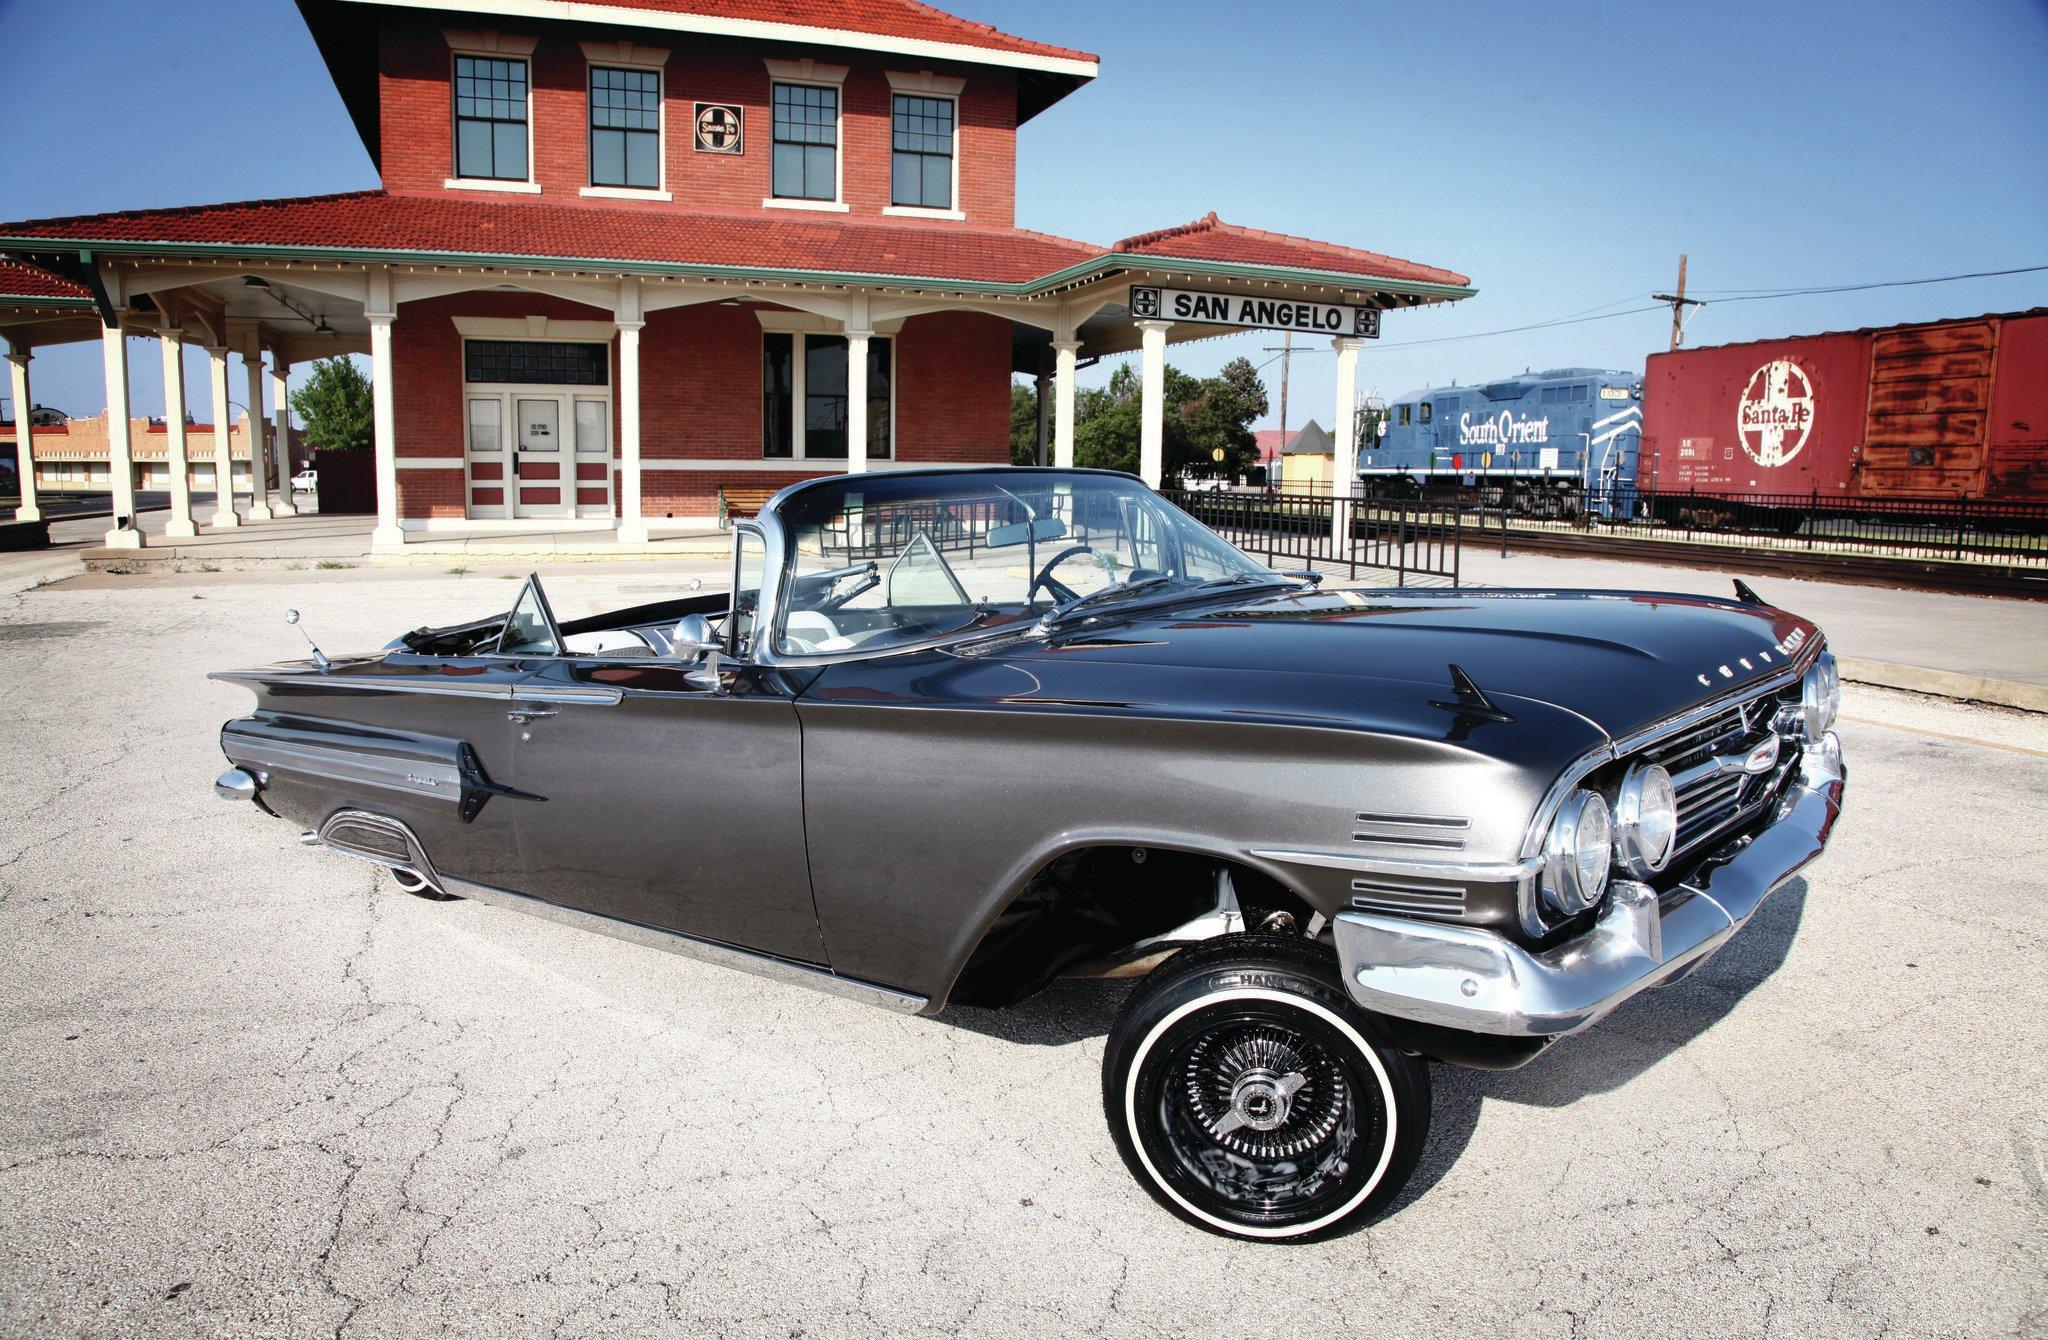 1960 Chevrolet Impala Convertible Family Inheritance